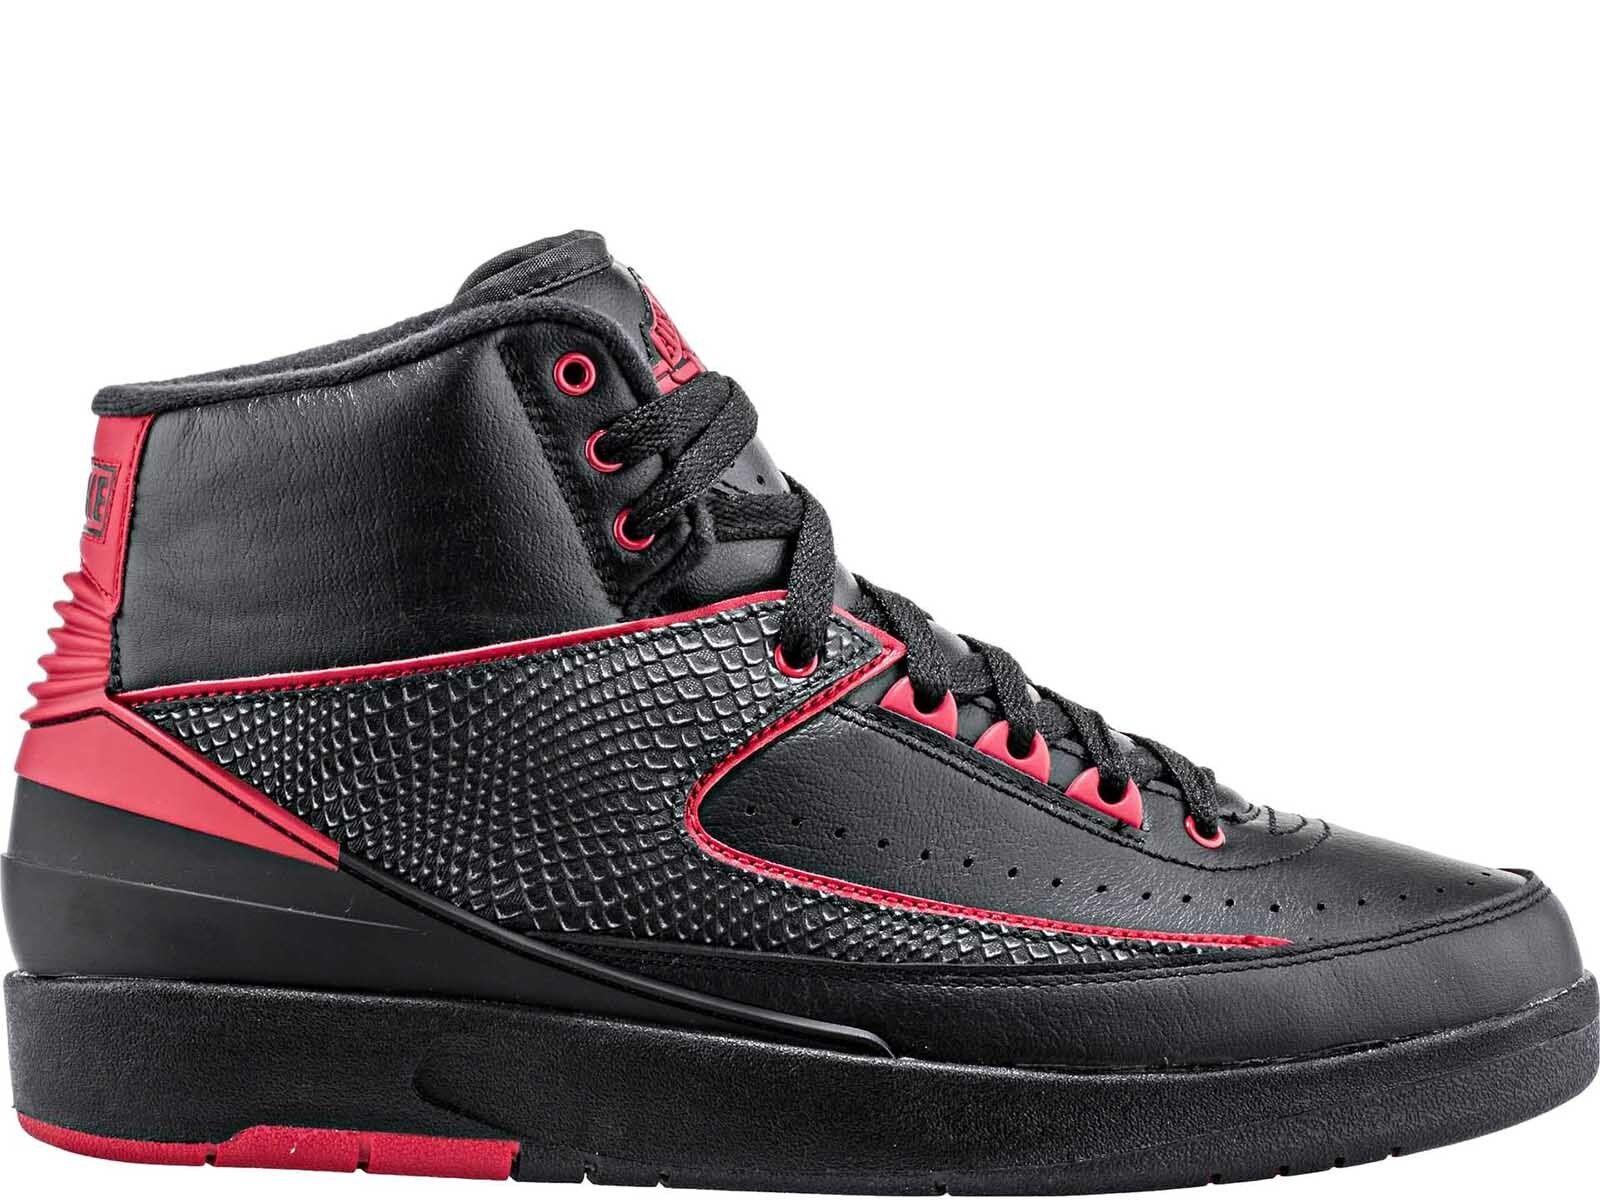 Mens Brand New Air Jordan 2 Retro  Alternative 87  Fashion Turnschuhe